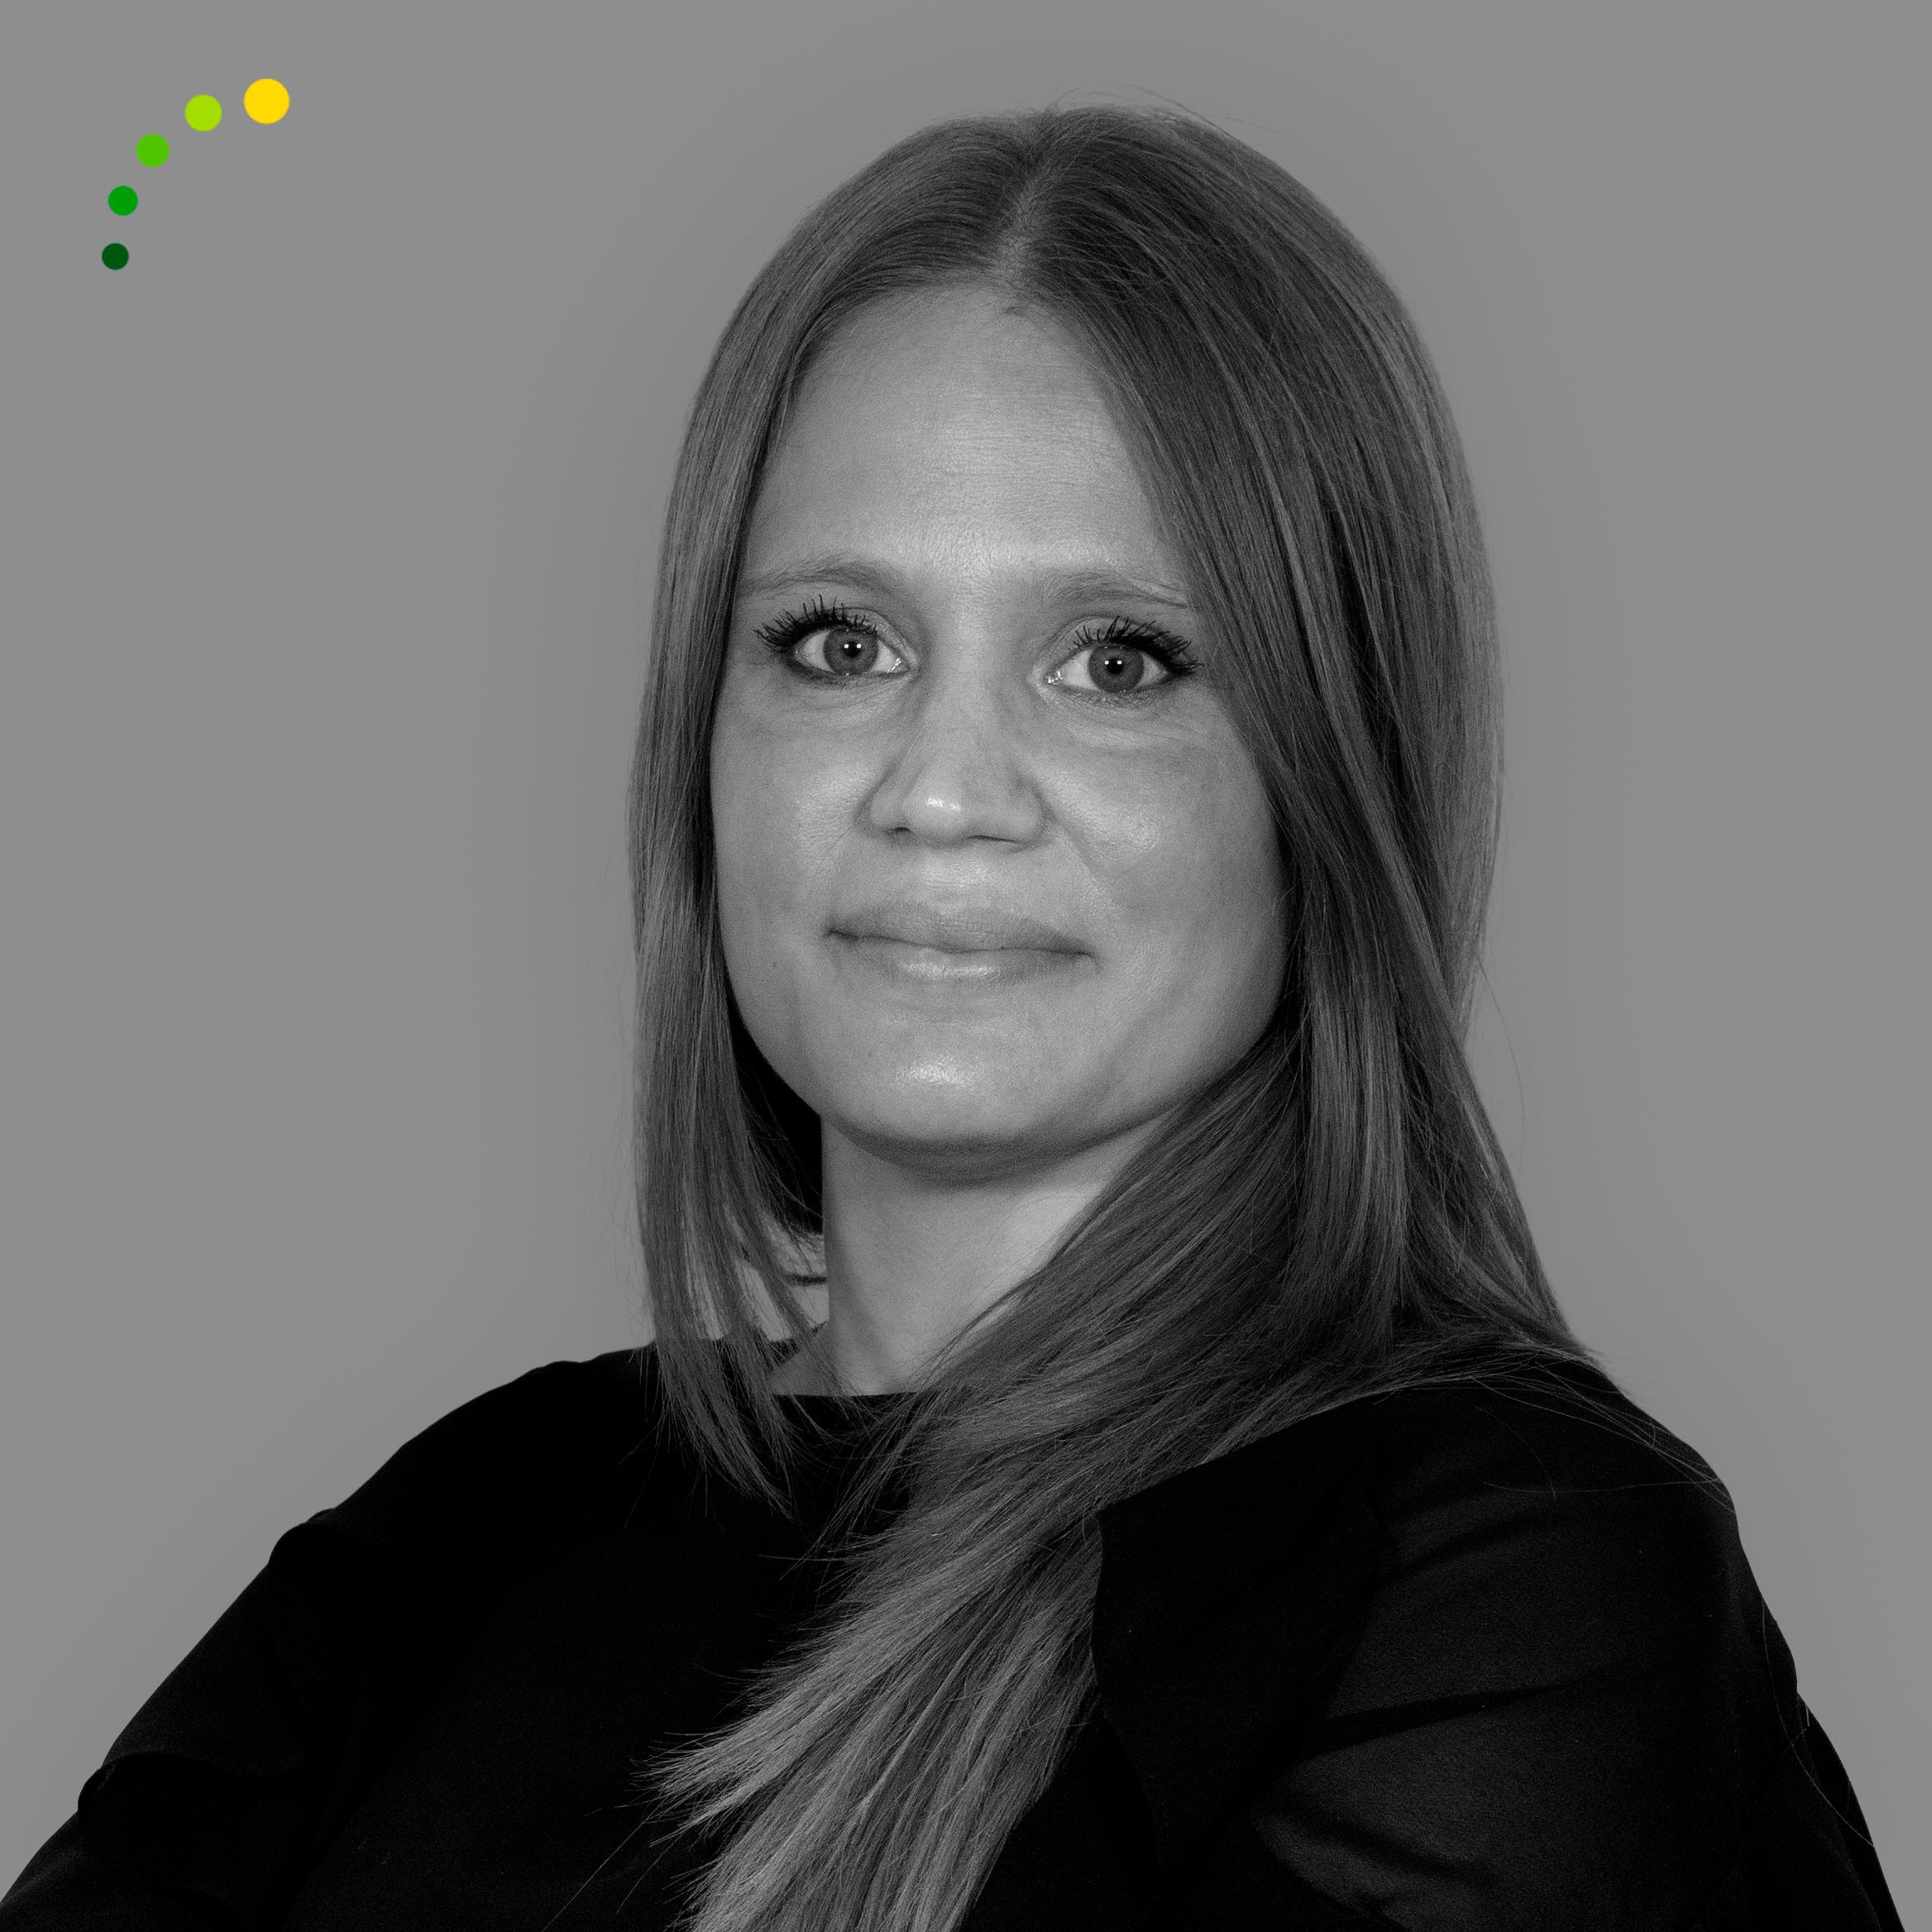 Francesca Balasso